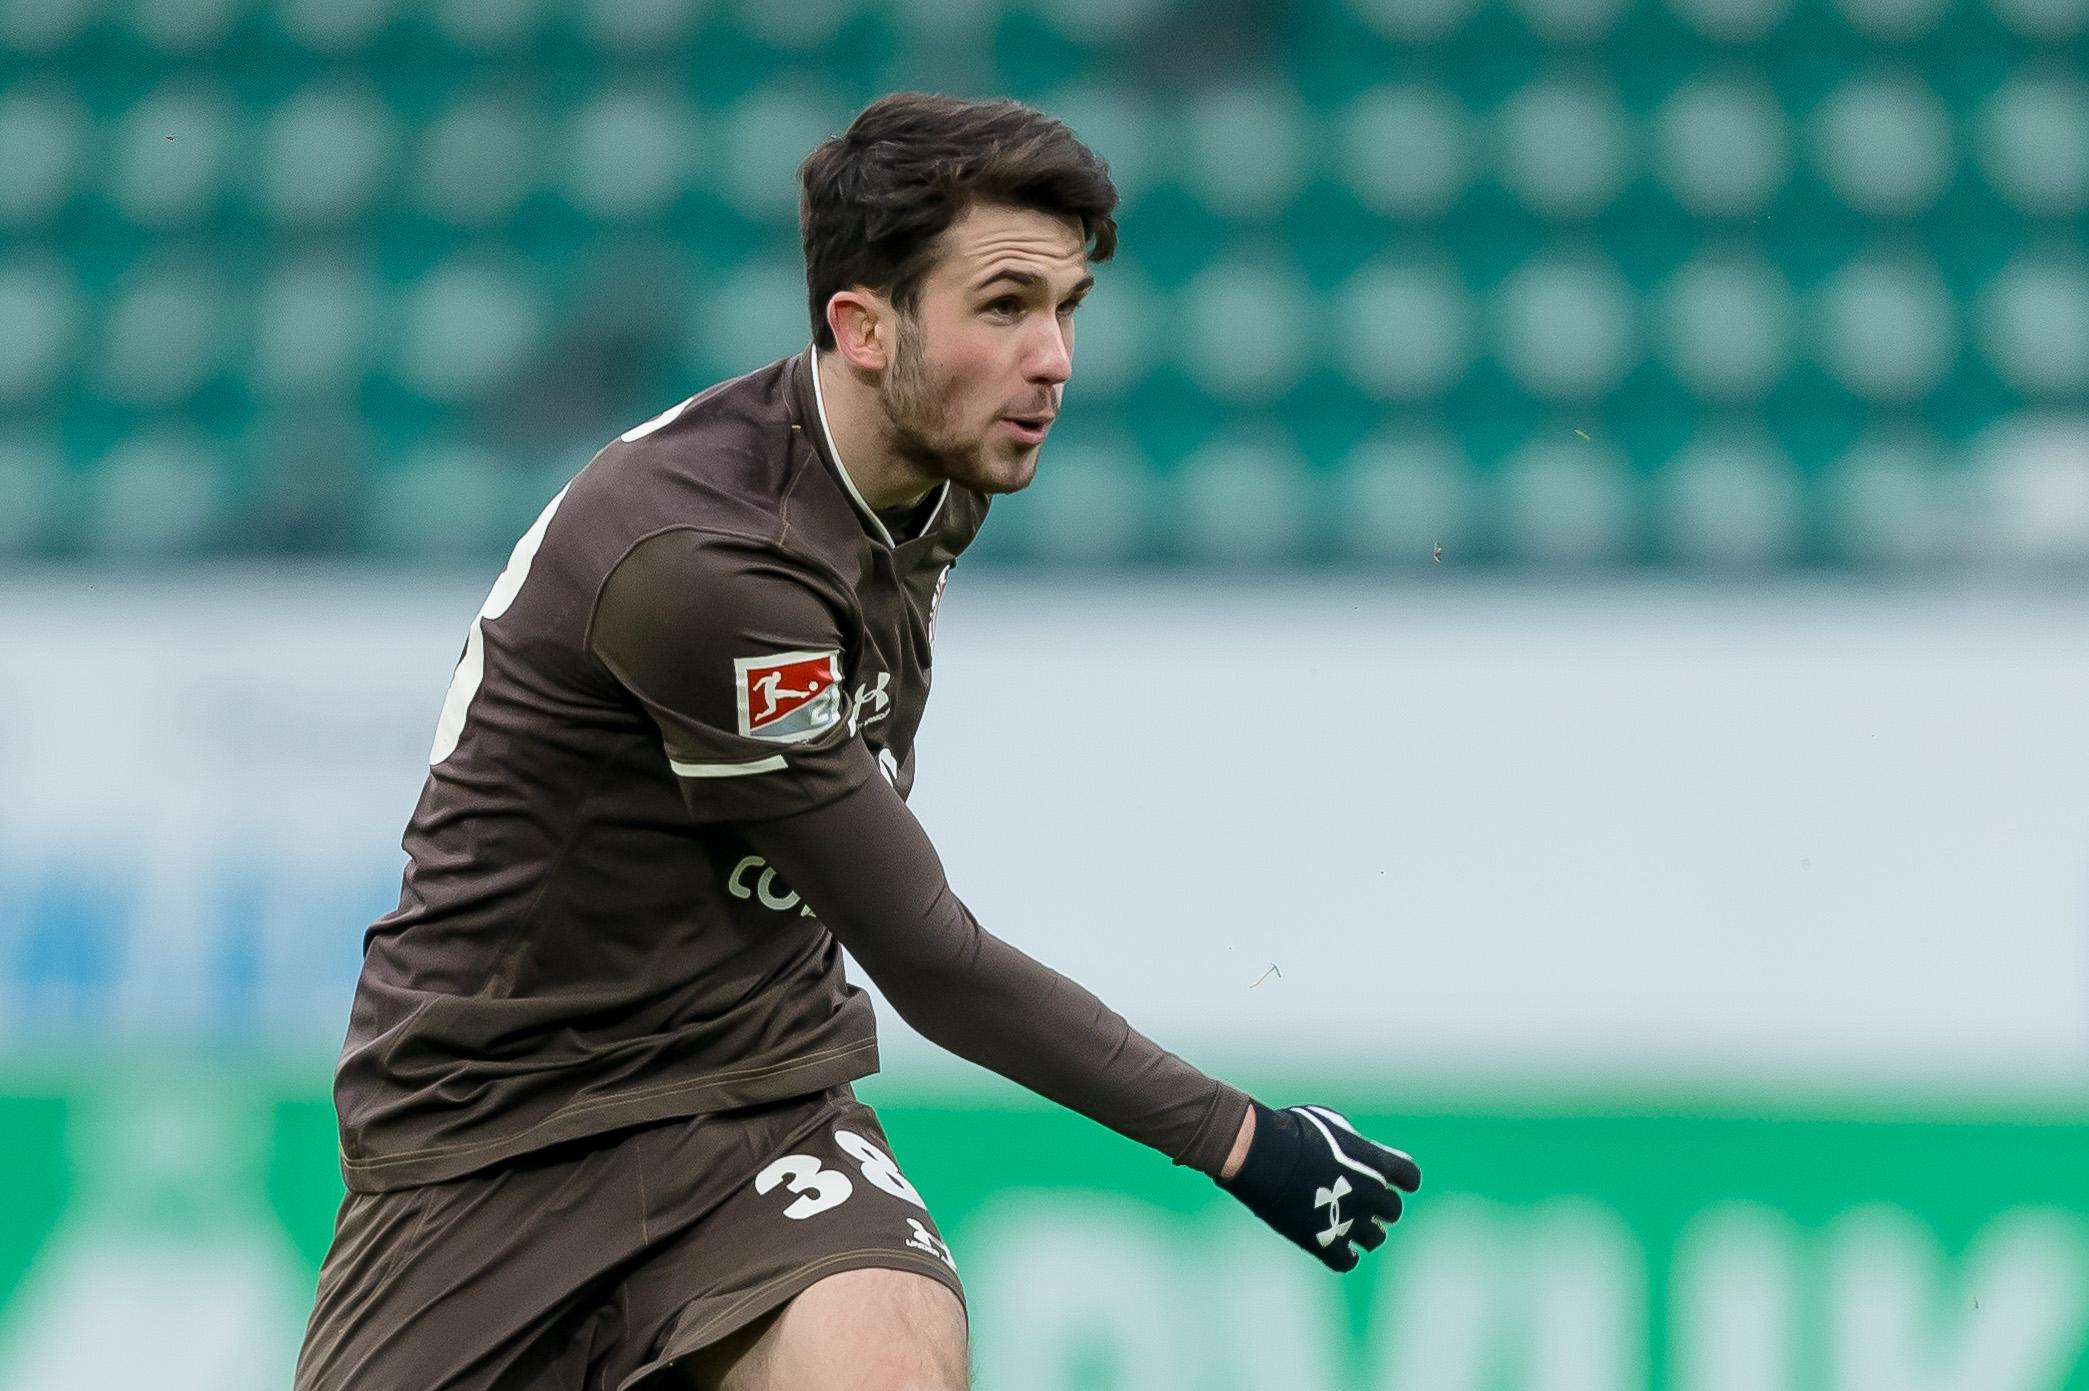 SpVgg Greuther Fürth v FC St. Pauli - Second Bundesliga